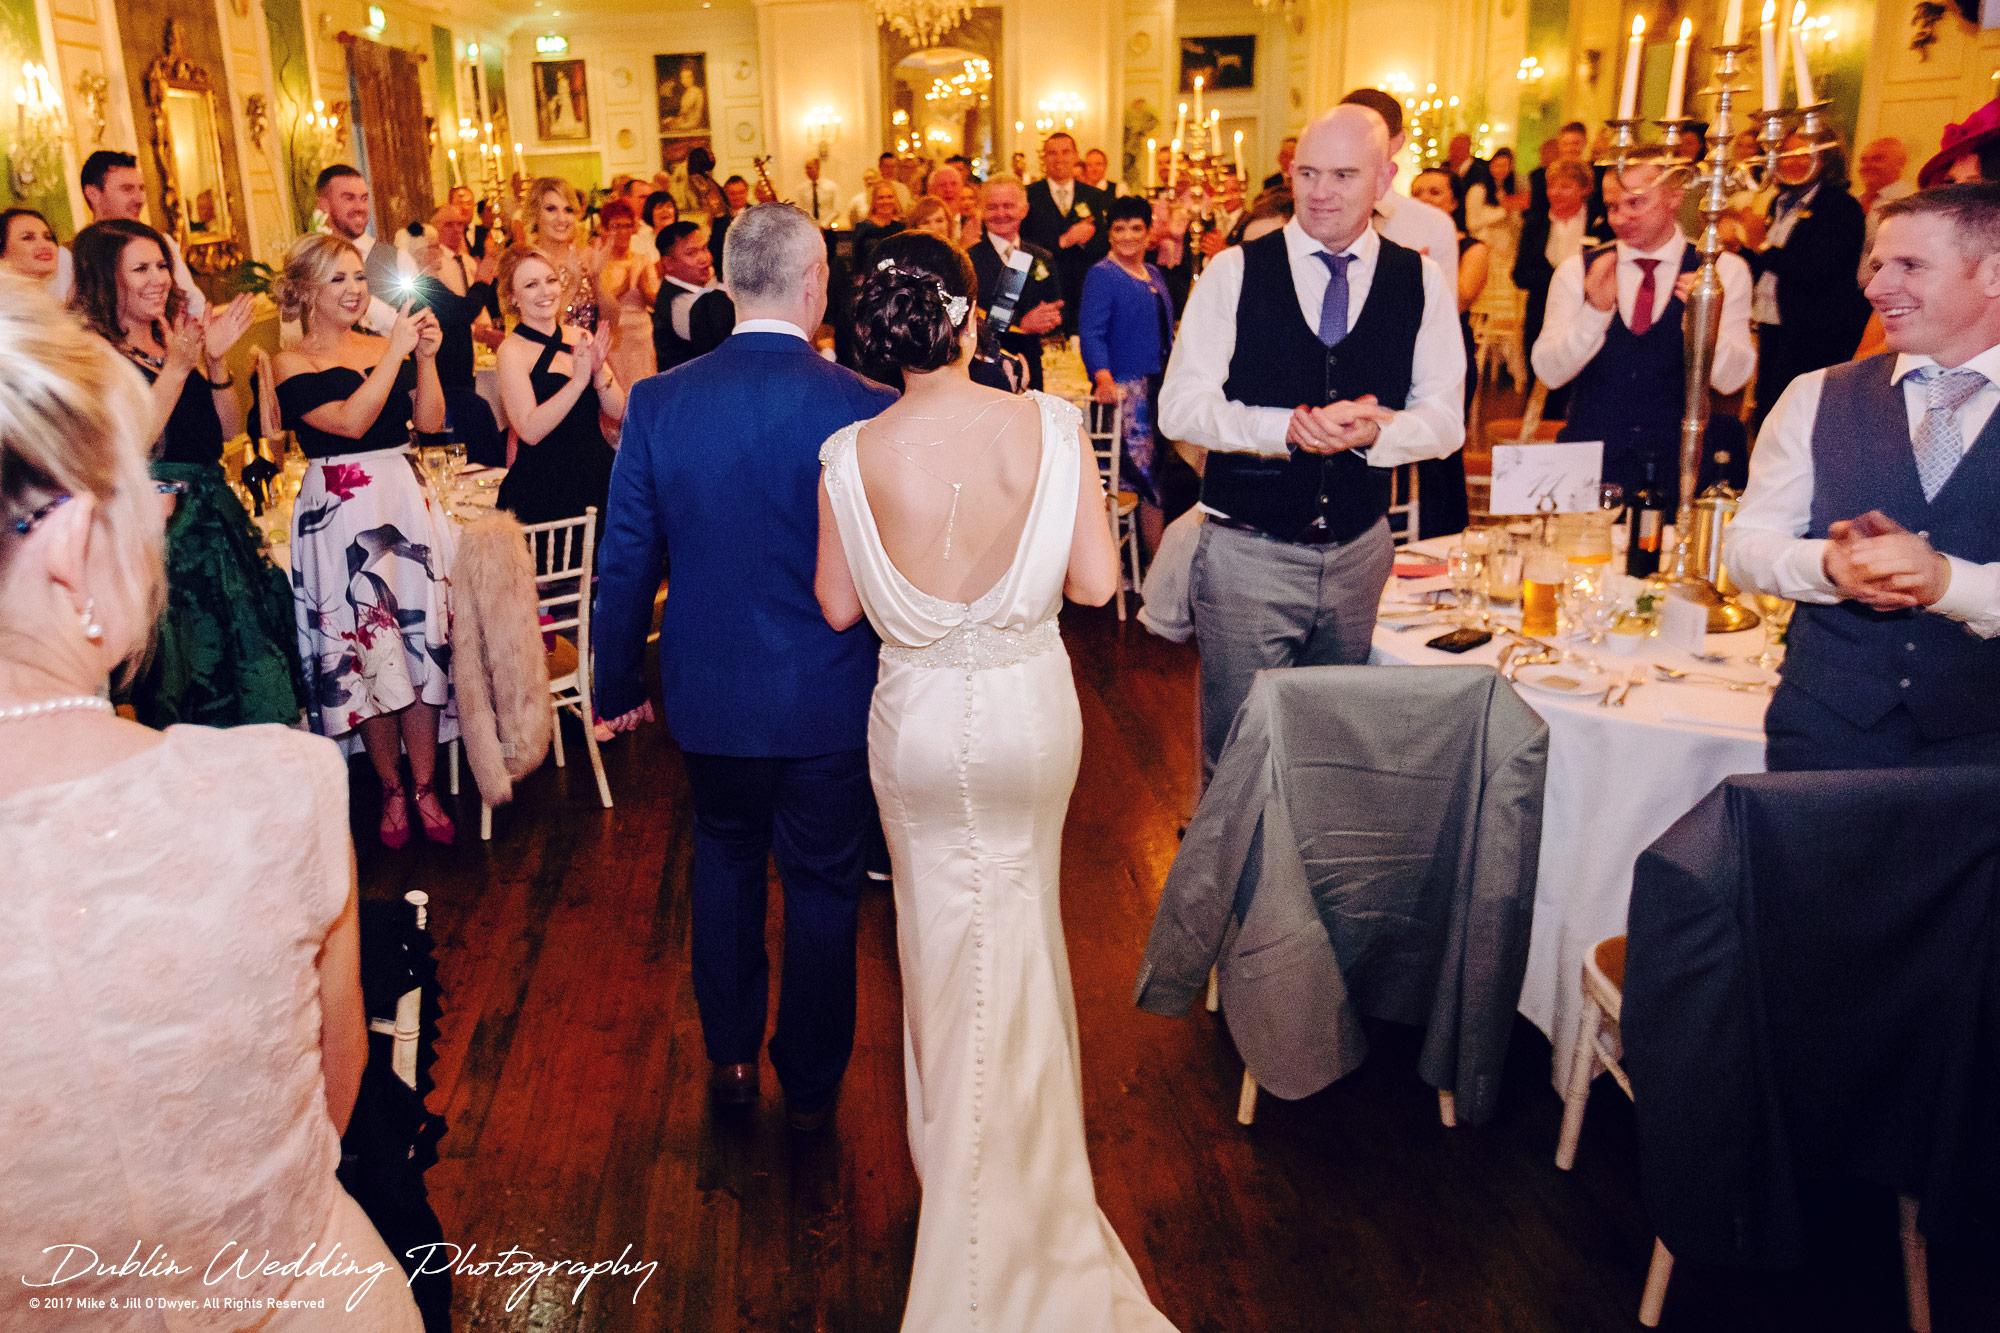 Castle Durrow Wedding Photographer County Laois Bride & Groom Wedding Reception Entrance